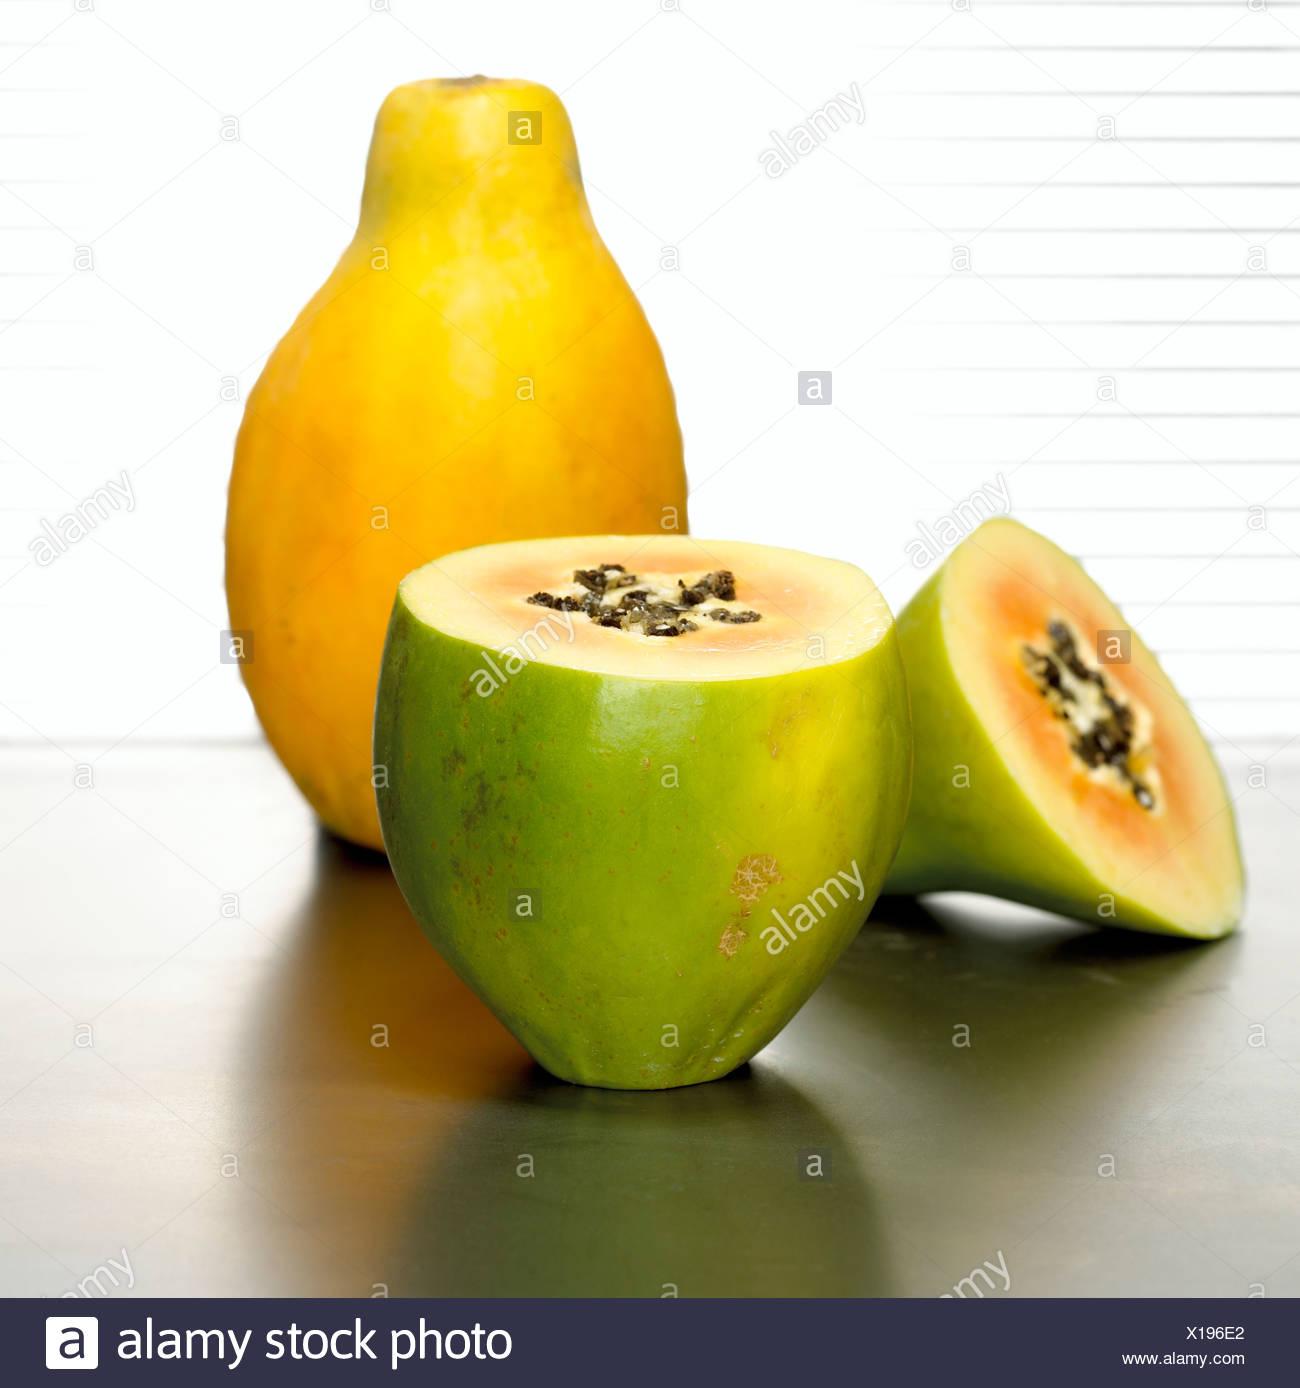 Papayas, close-up - Stock Image